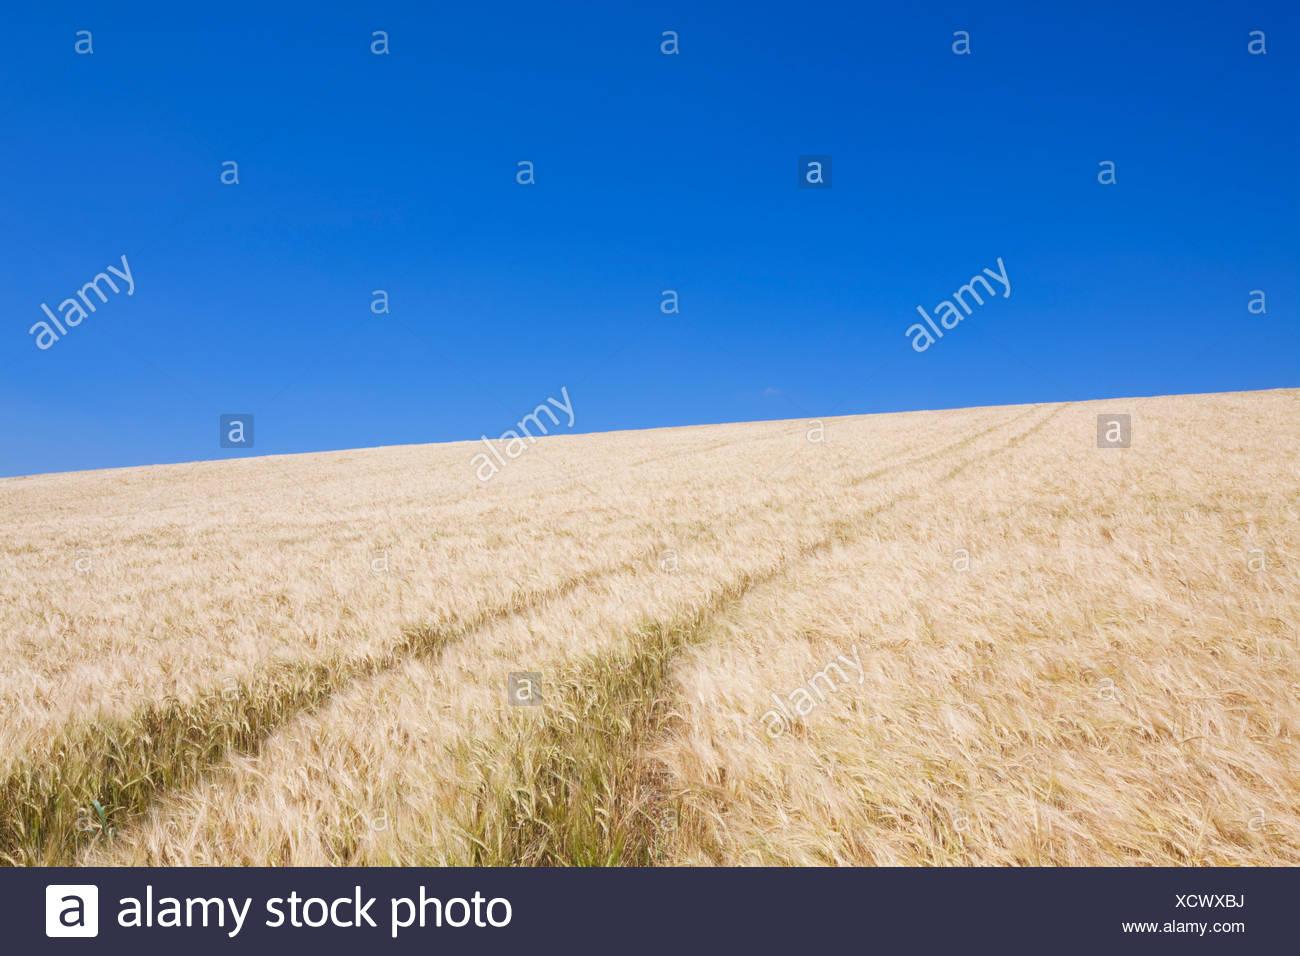 Tracks leading through wheat field, Dorset, England - Stock Image